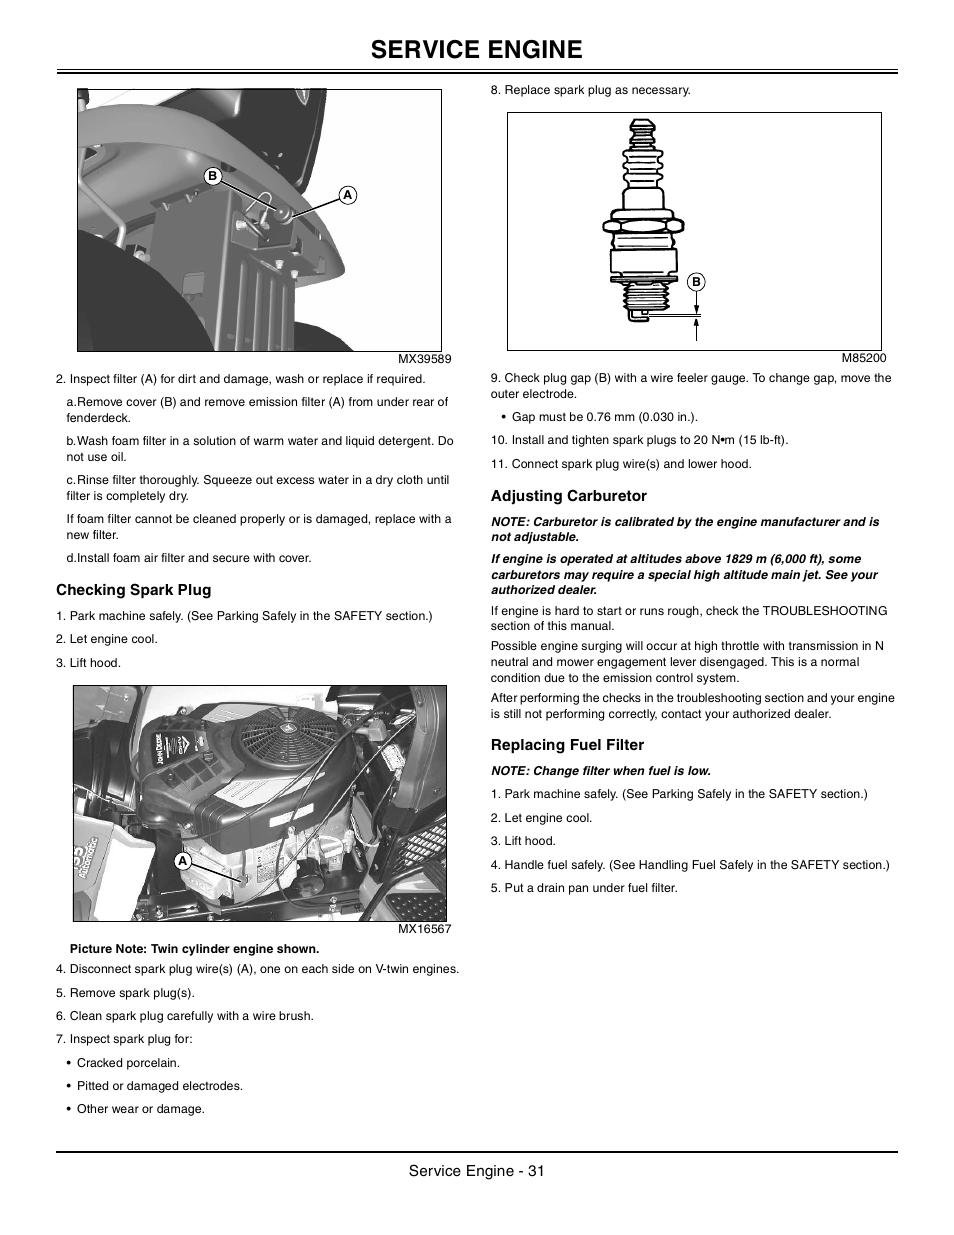 Checking Spark Plug Adjusting Carburetor Replacing Fuel